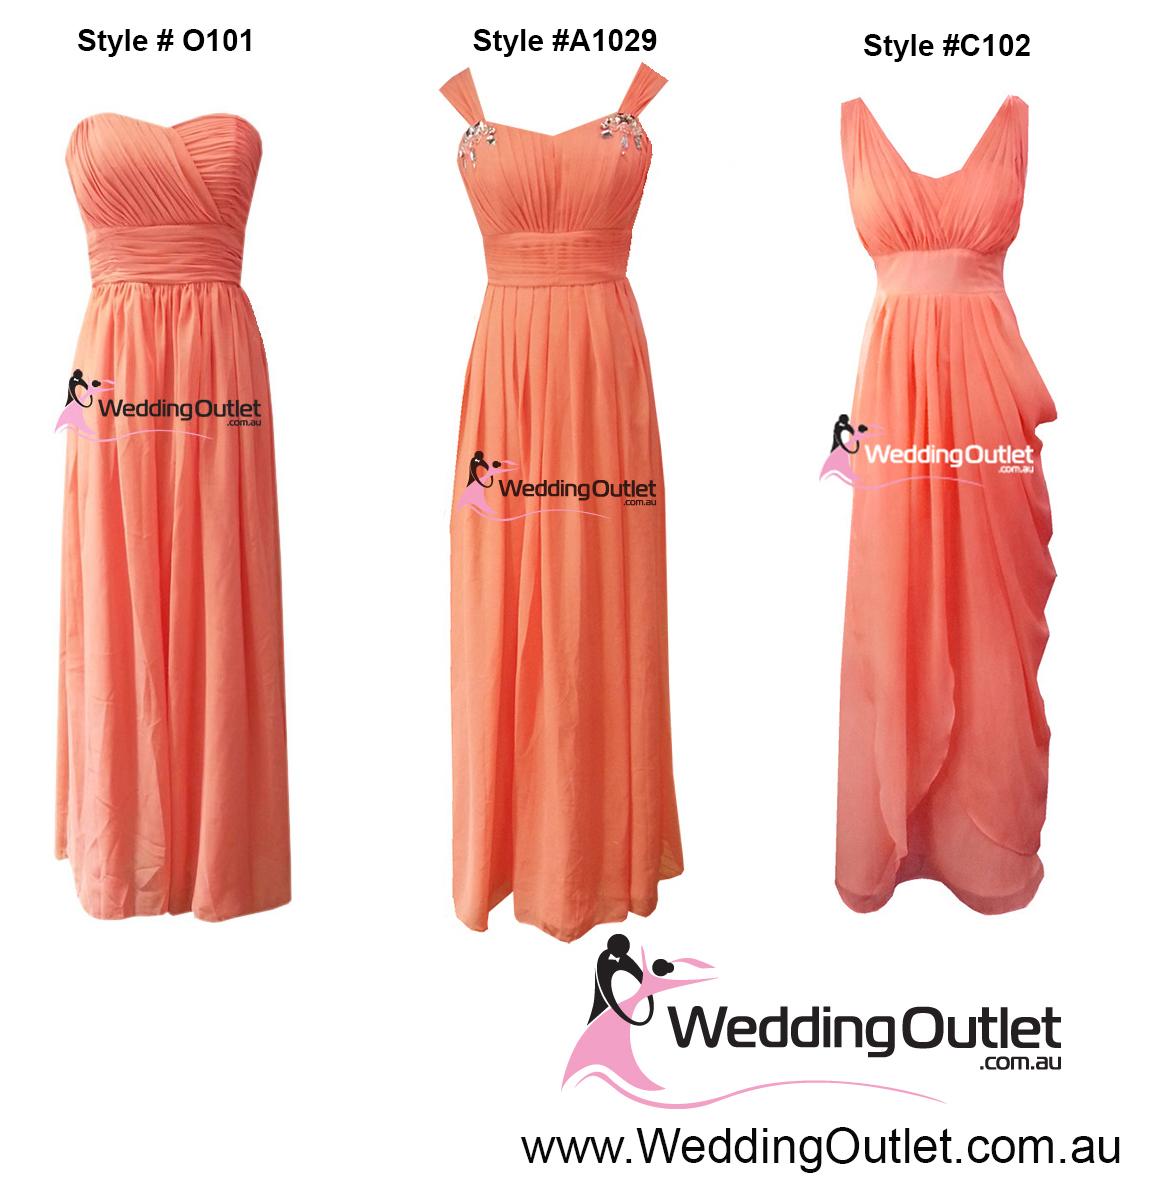 Coral bridesmaid dresses weddingoutlet coral bridesmaid dresses ombrellifo Gallery